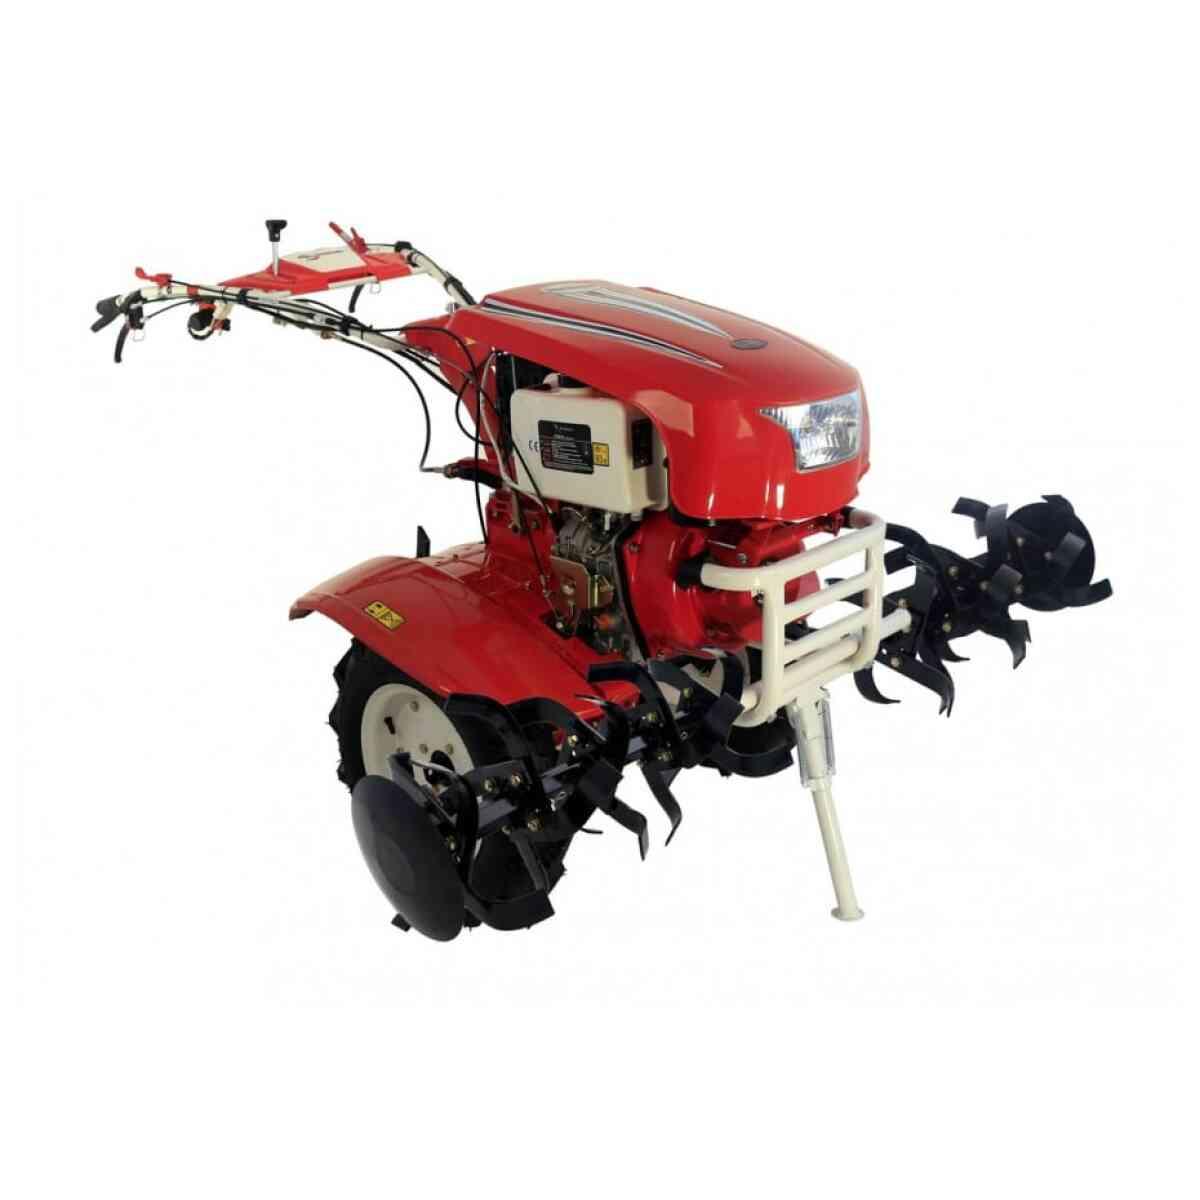 motocultor pro series new 1350 s o mac.ro 1 1 52